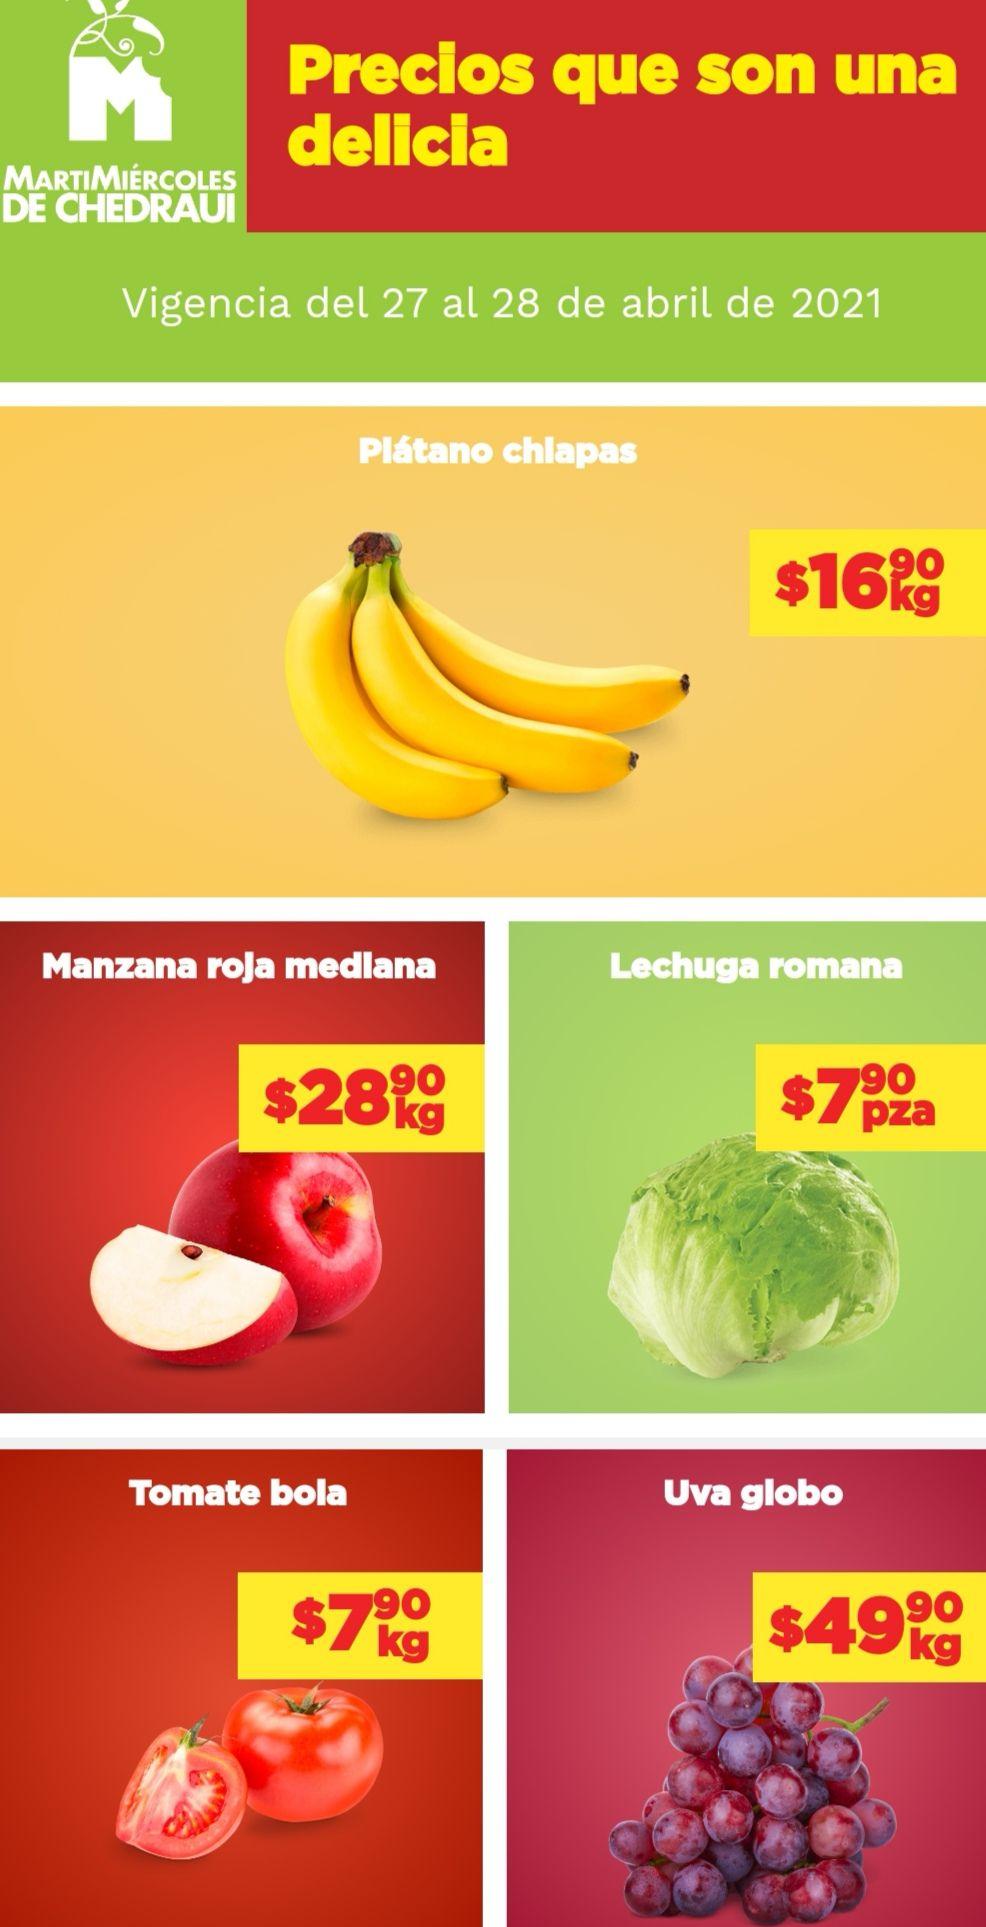 Chedraui: MartiMiércoles de Chedraui 27 y 28 Abril: Jitomate Bola kg. ó Lechuga pza. $7.90... Plátano $16.90 kg... Manzana Roja $28.90 kg.